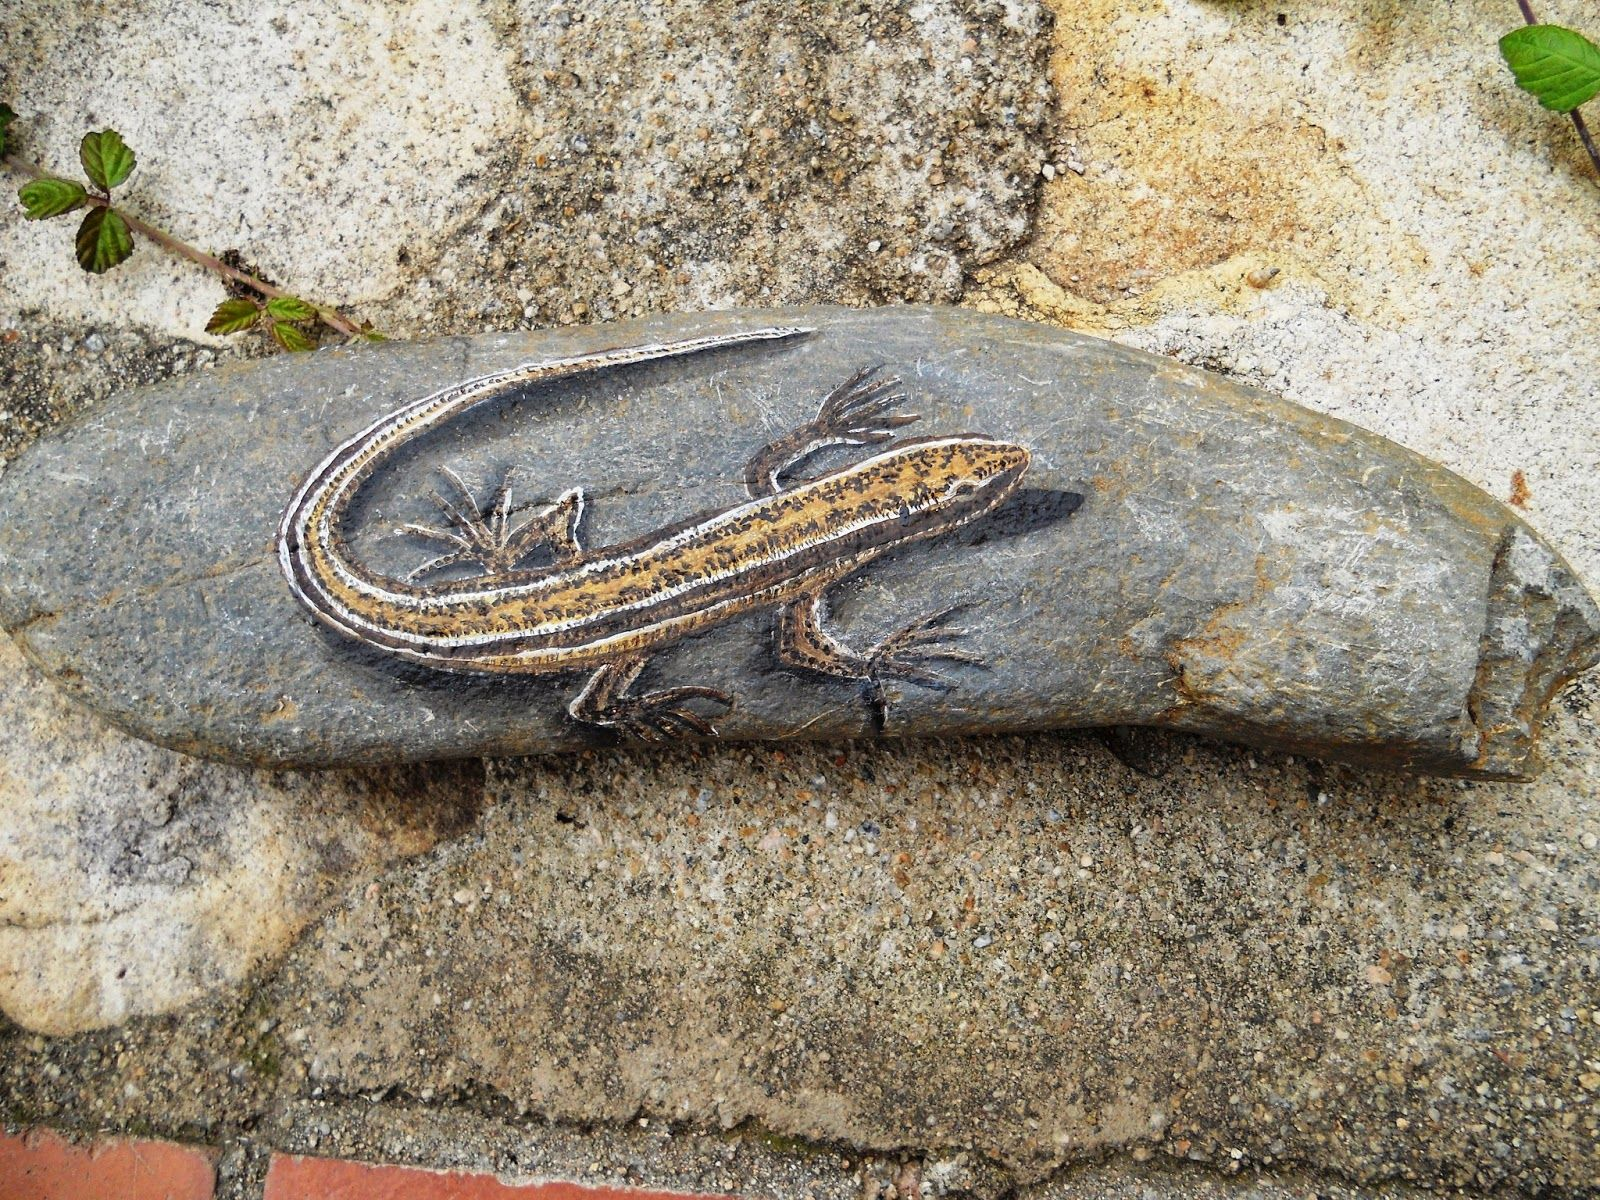 Piedras pintadas a mano lagartija tomando el sol rocks pinterest rock painting rock and Piedras pintadas a mano